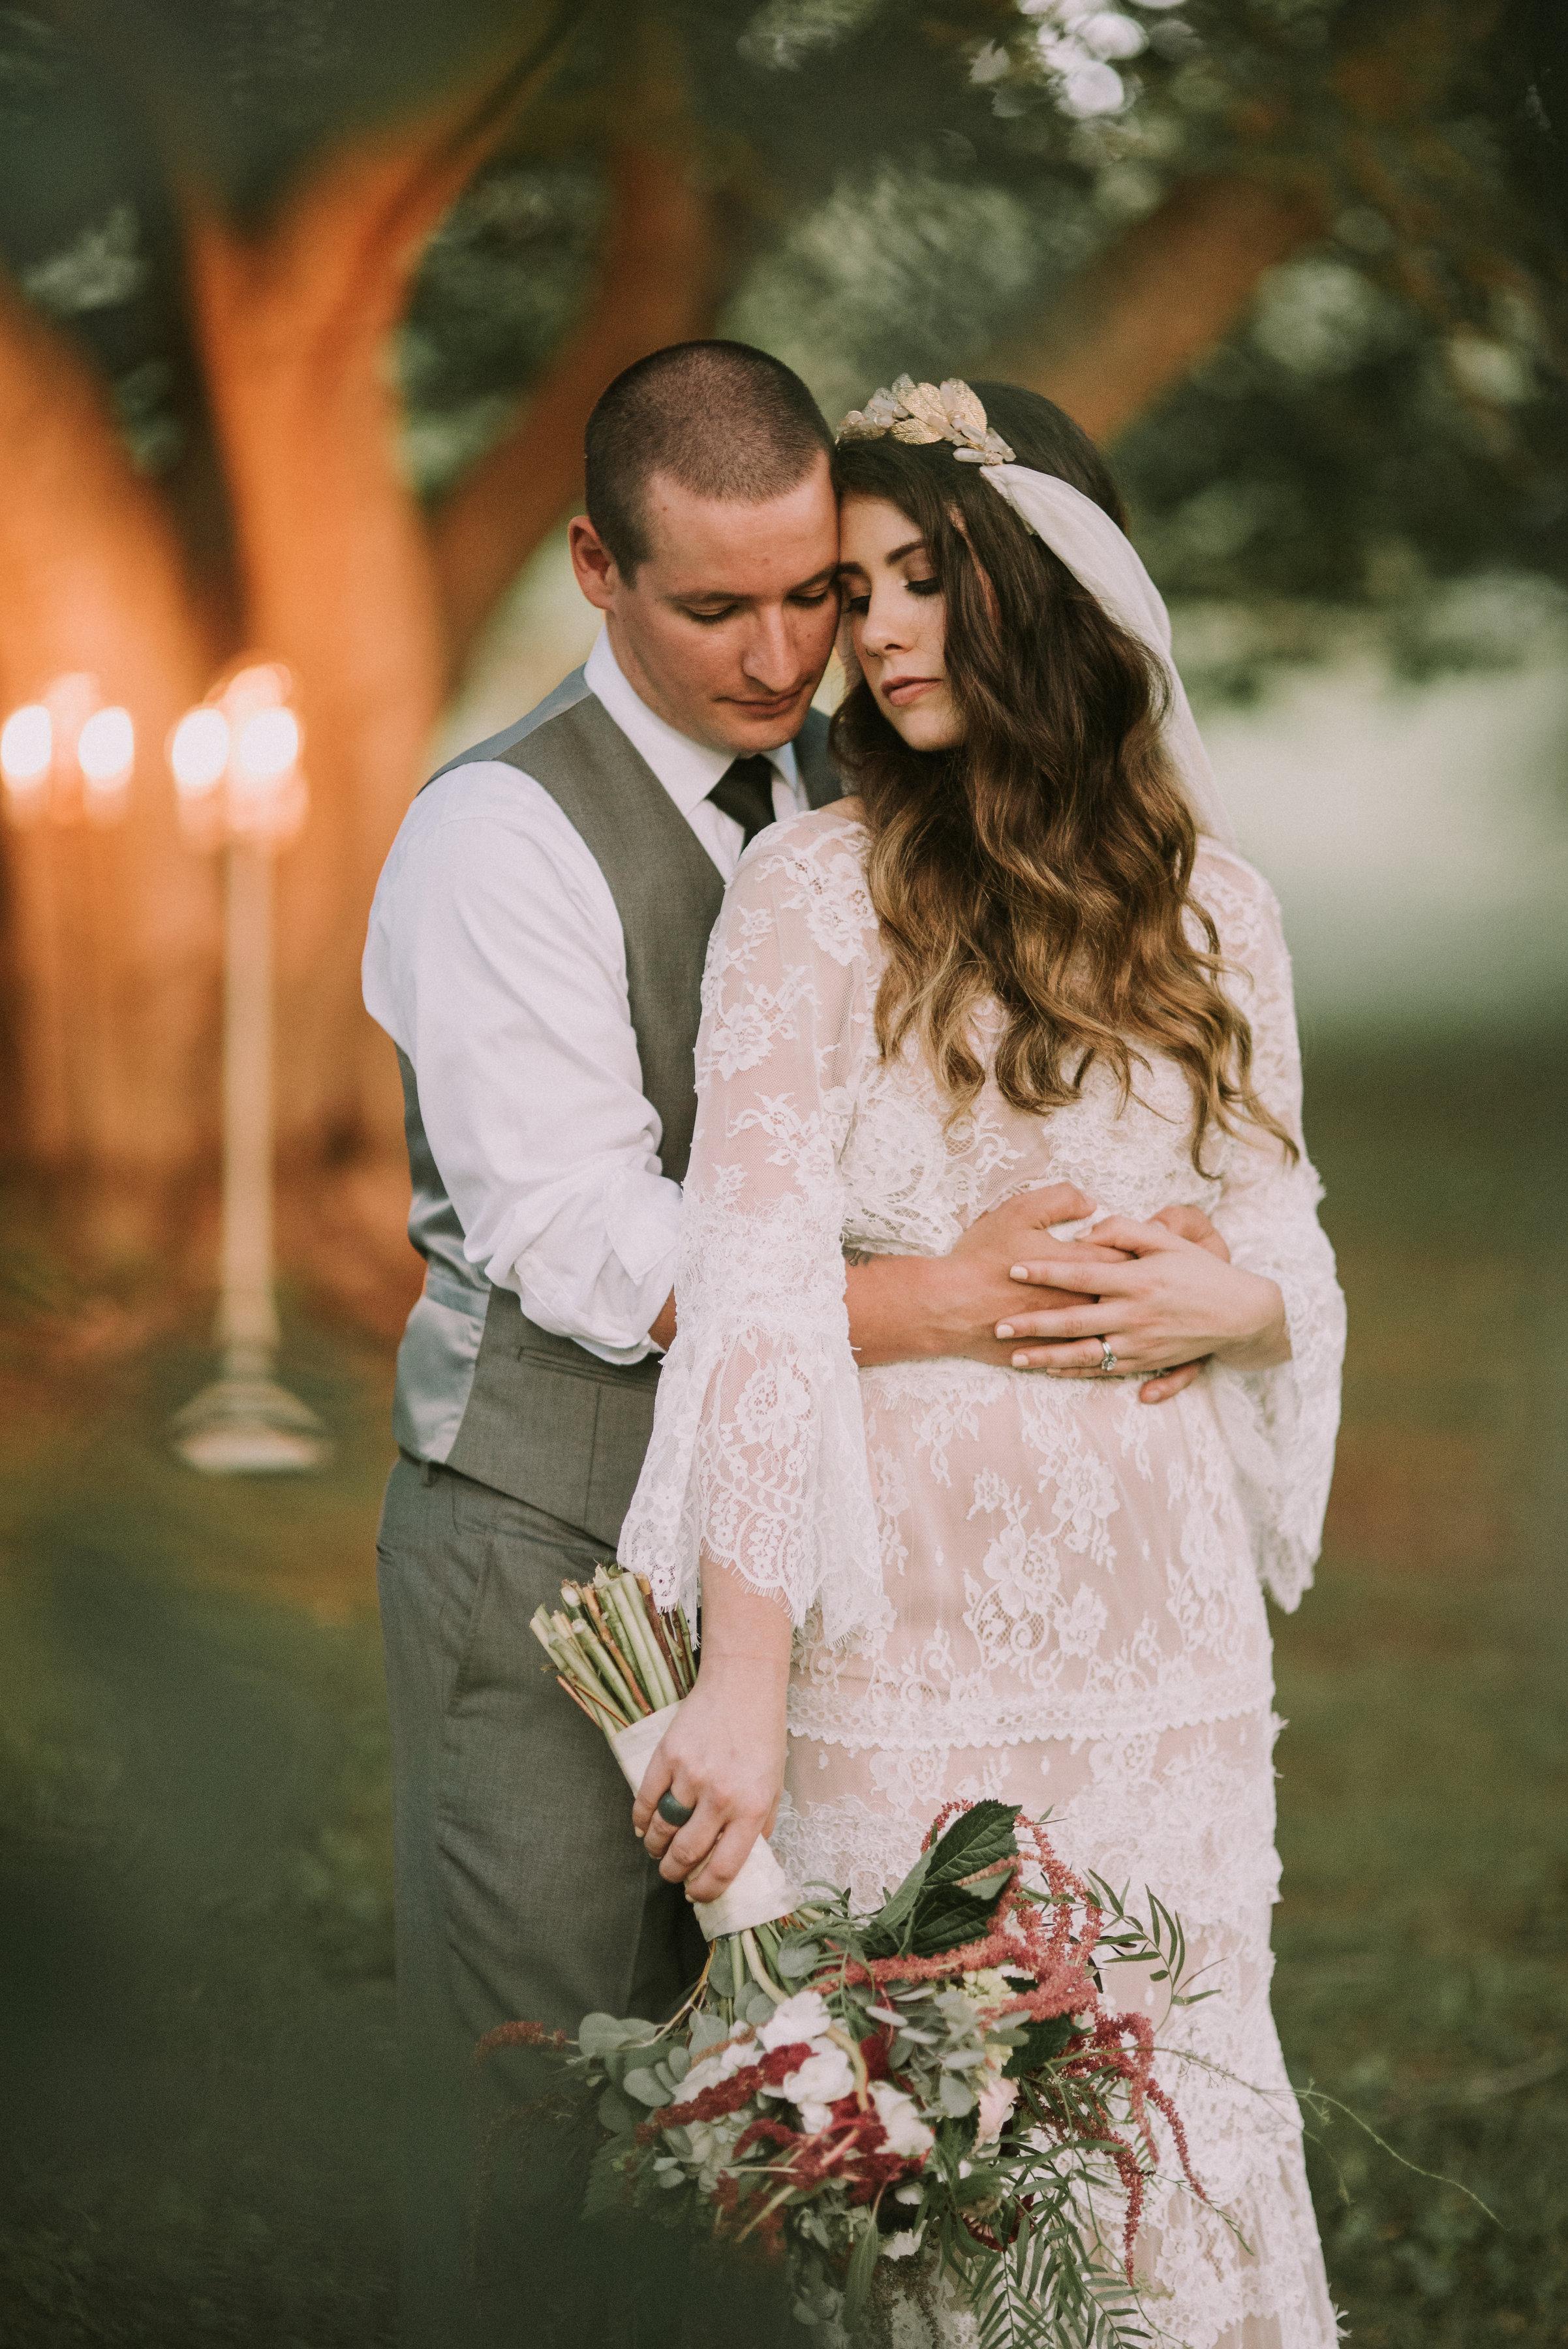 Ohio Wedding Photography | Chelsea Hall Photography | www.chelsea-hall.com